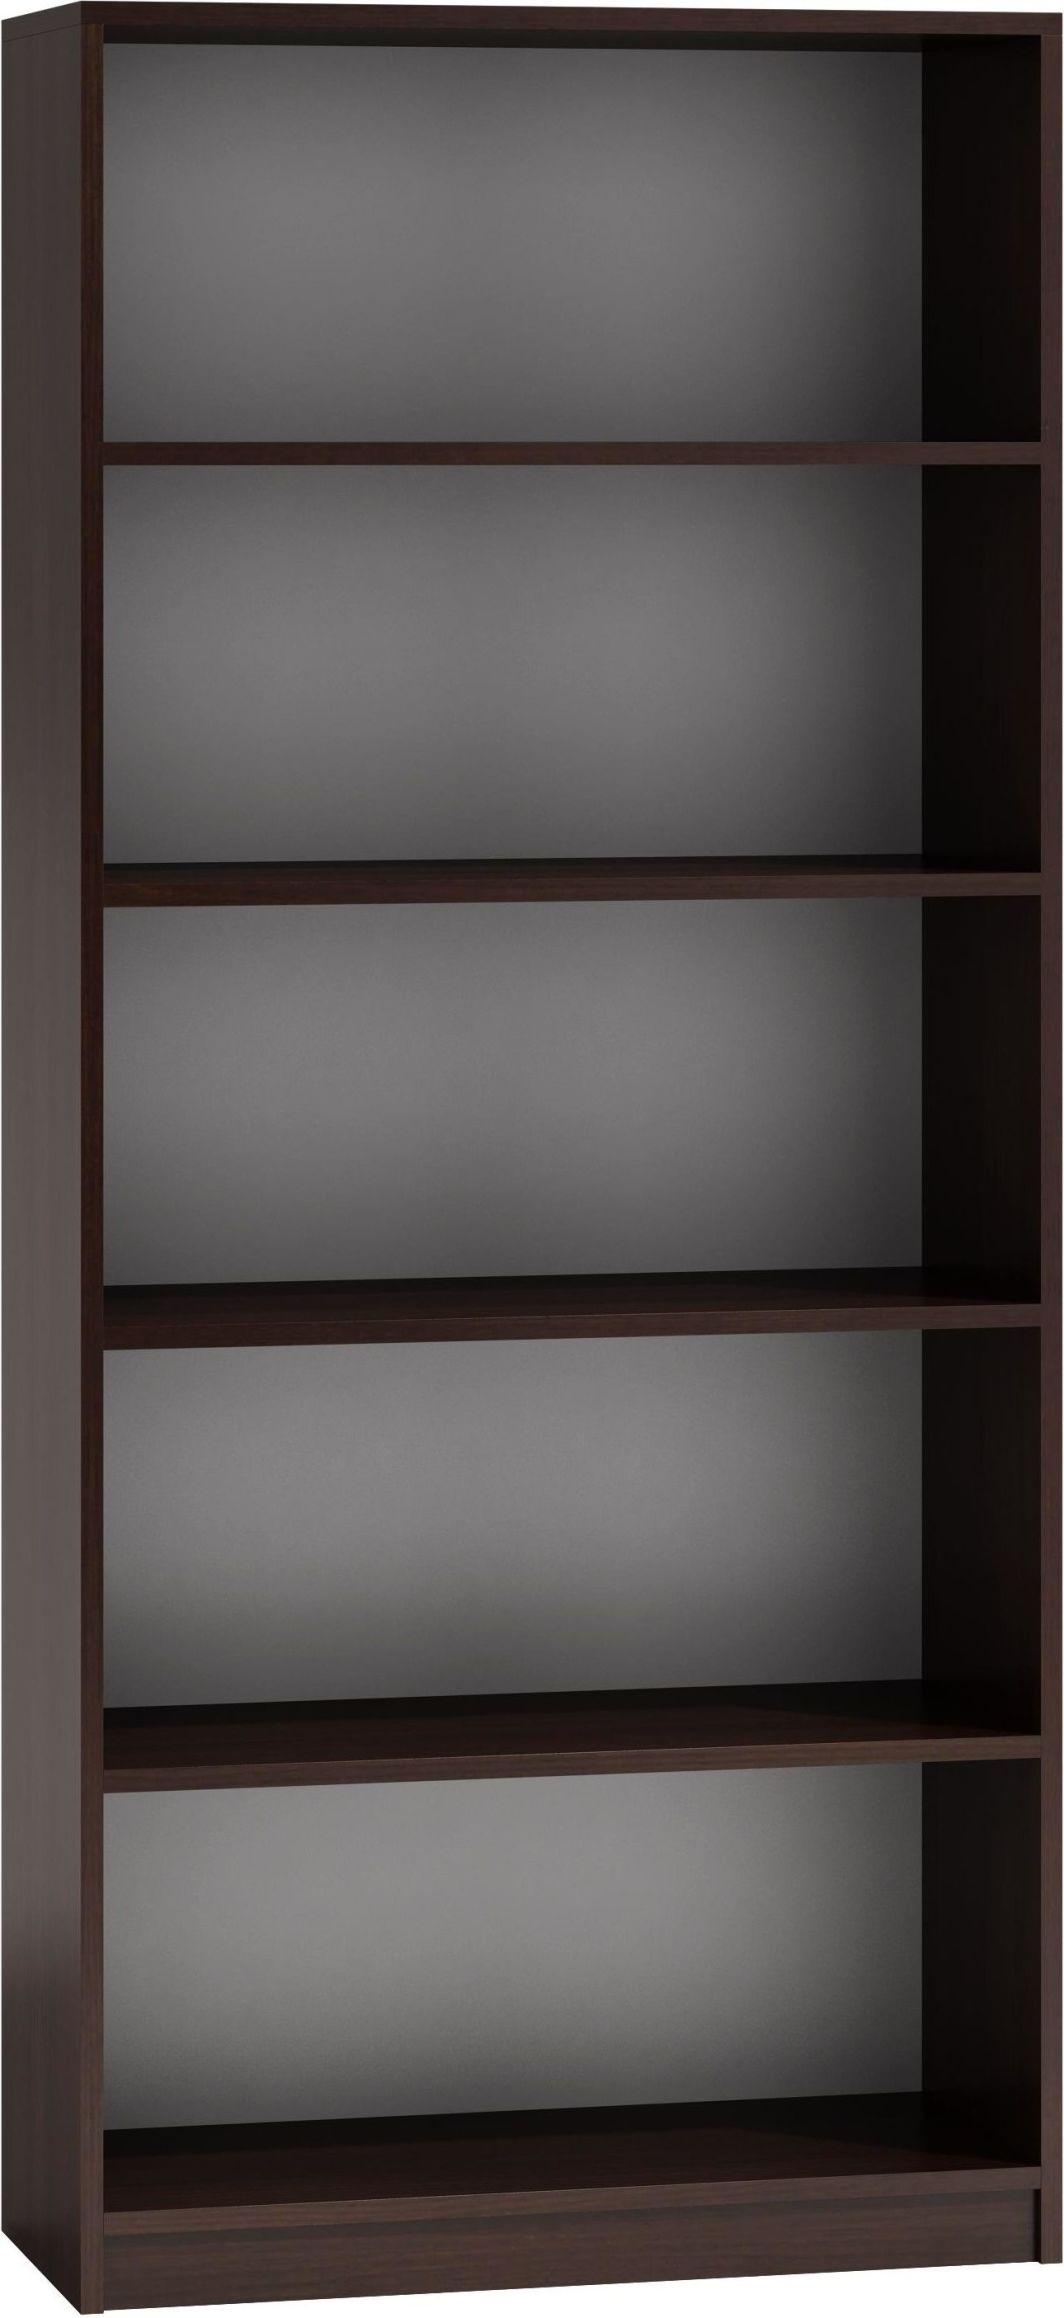 TopEshop Regał 80cm szafka książki segregatory r80 wenge 1